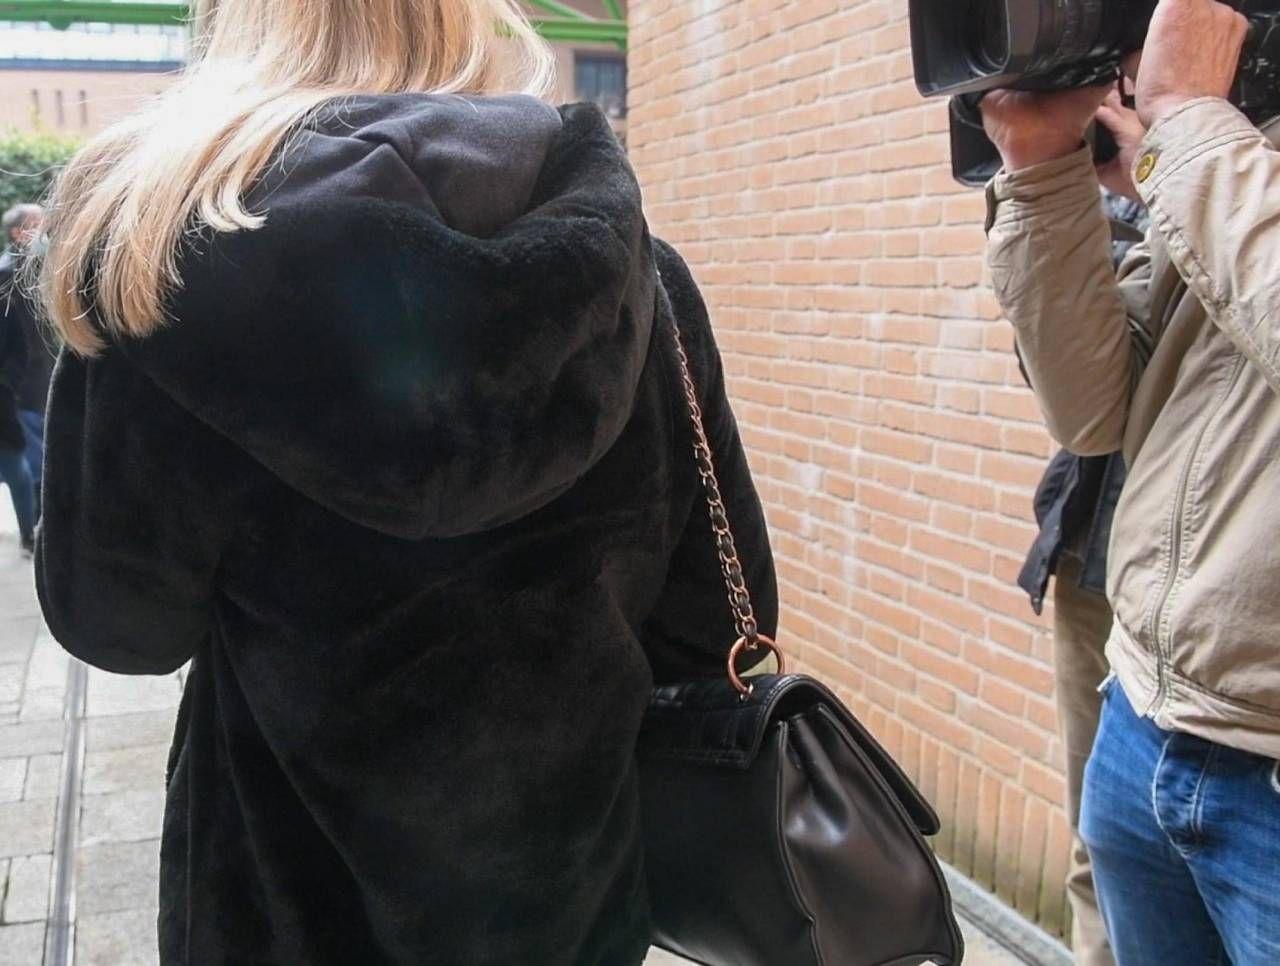 La maestra d'asilo ieri all'uscita dal tribunale di Torino